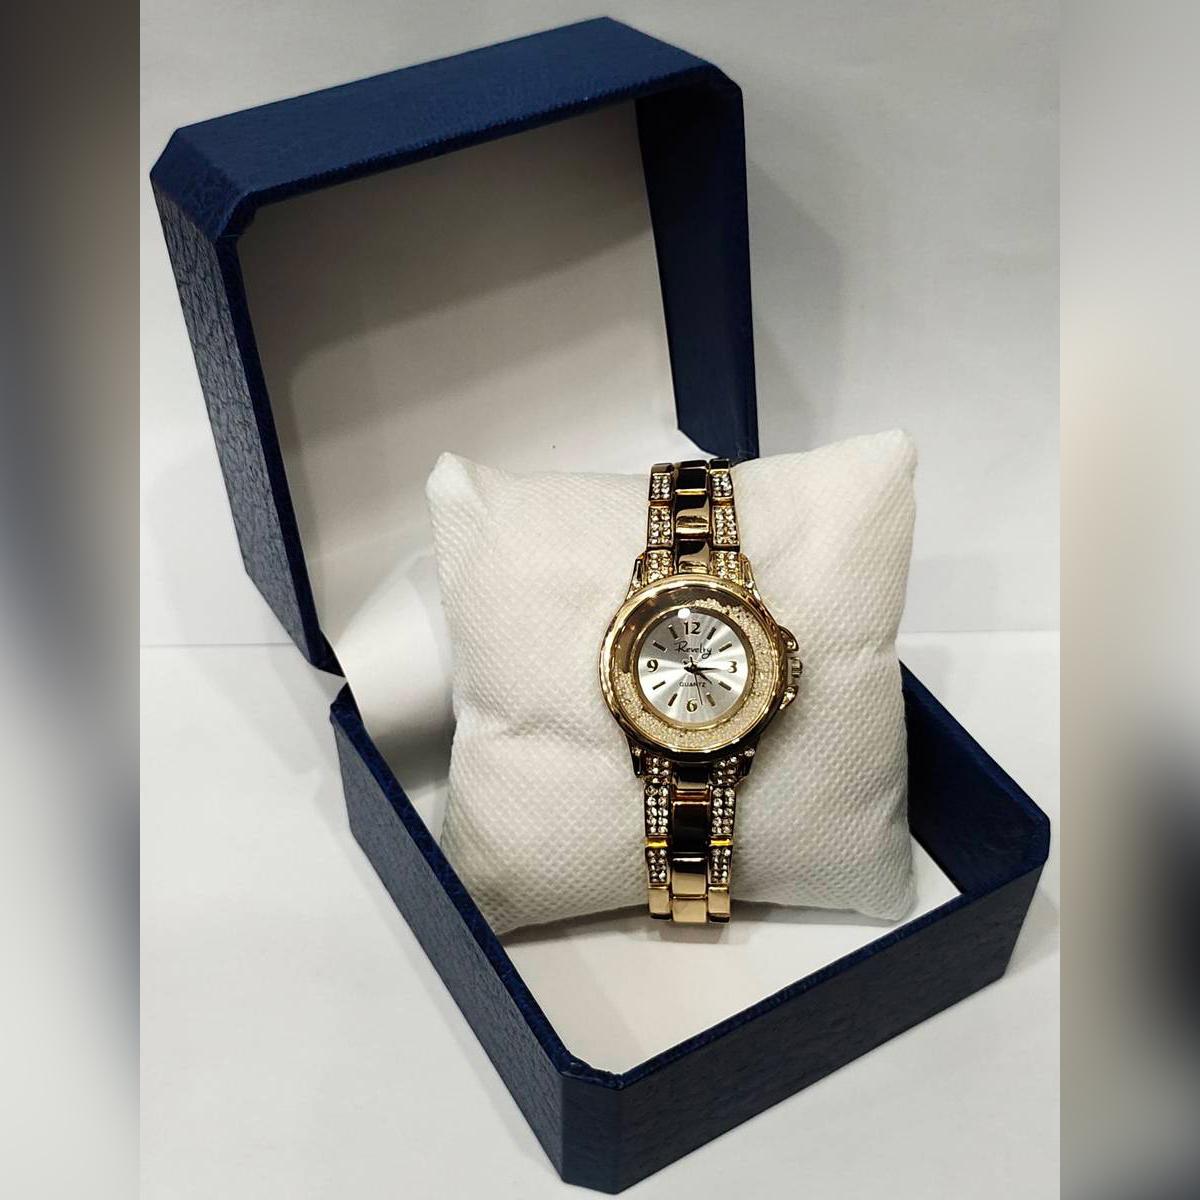 Stylish 2020 Wrist Watch for Women